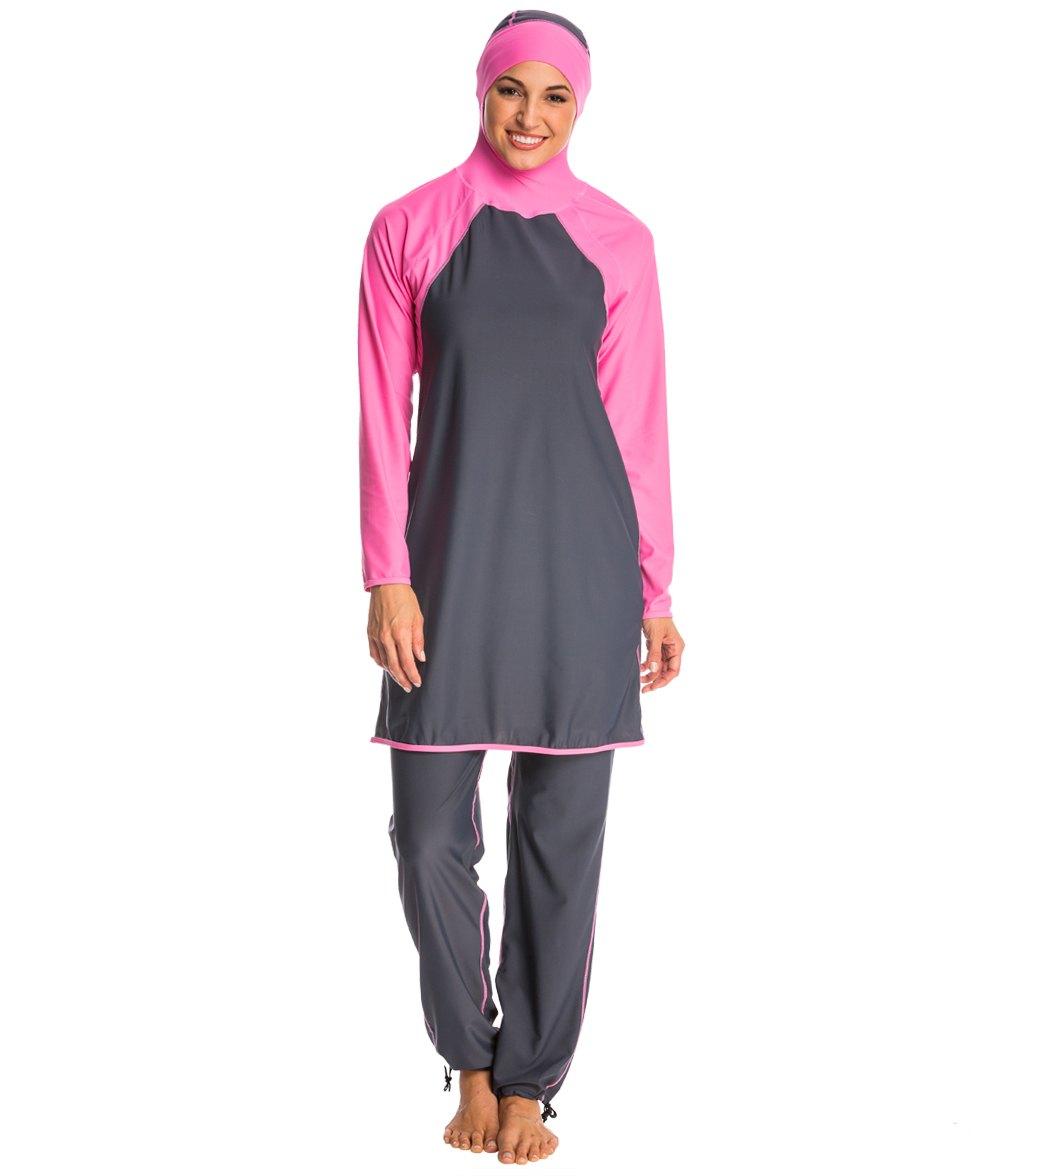 c63a6b9c4a9 Alsharifa Laguna Modest Swimsuit at SwimOutlet.com - Free Shipping